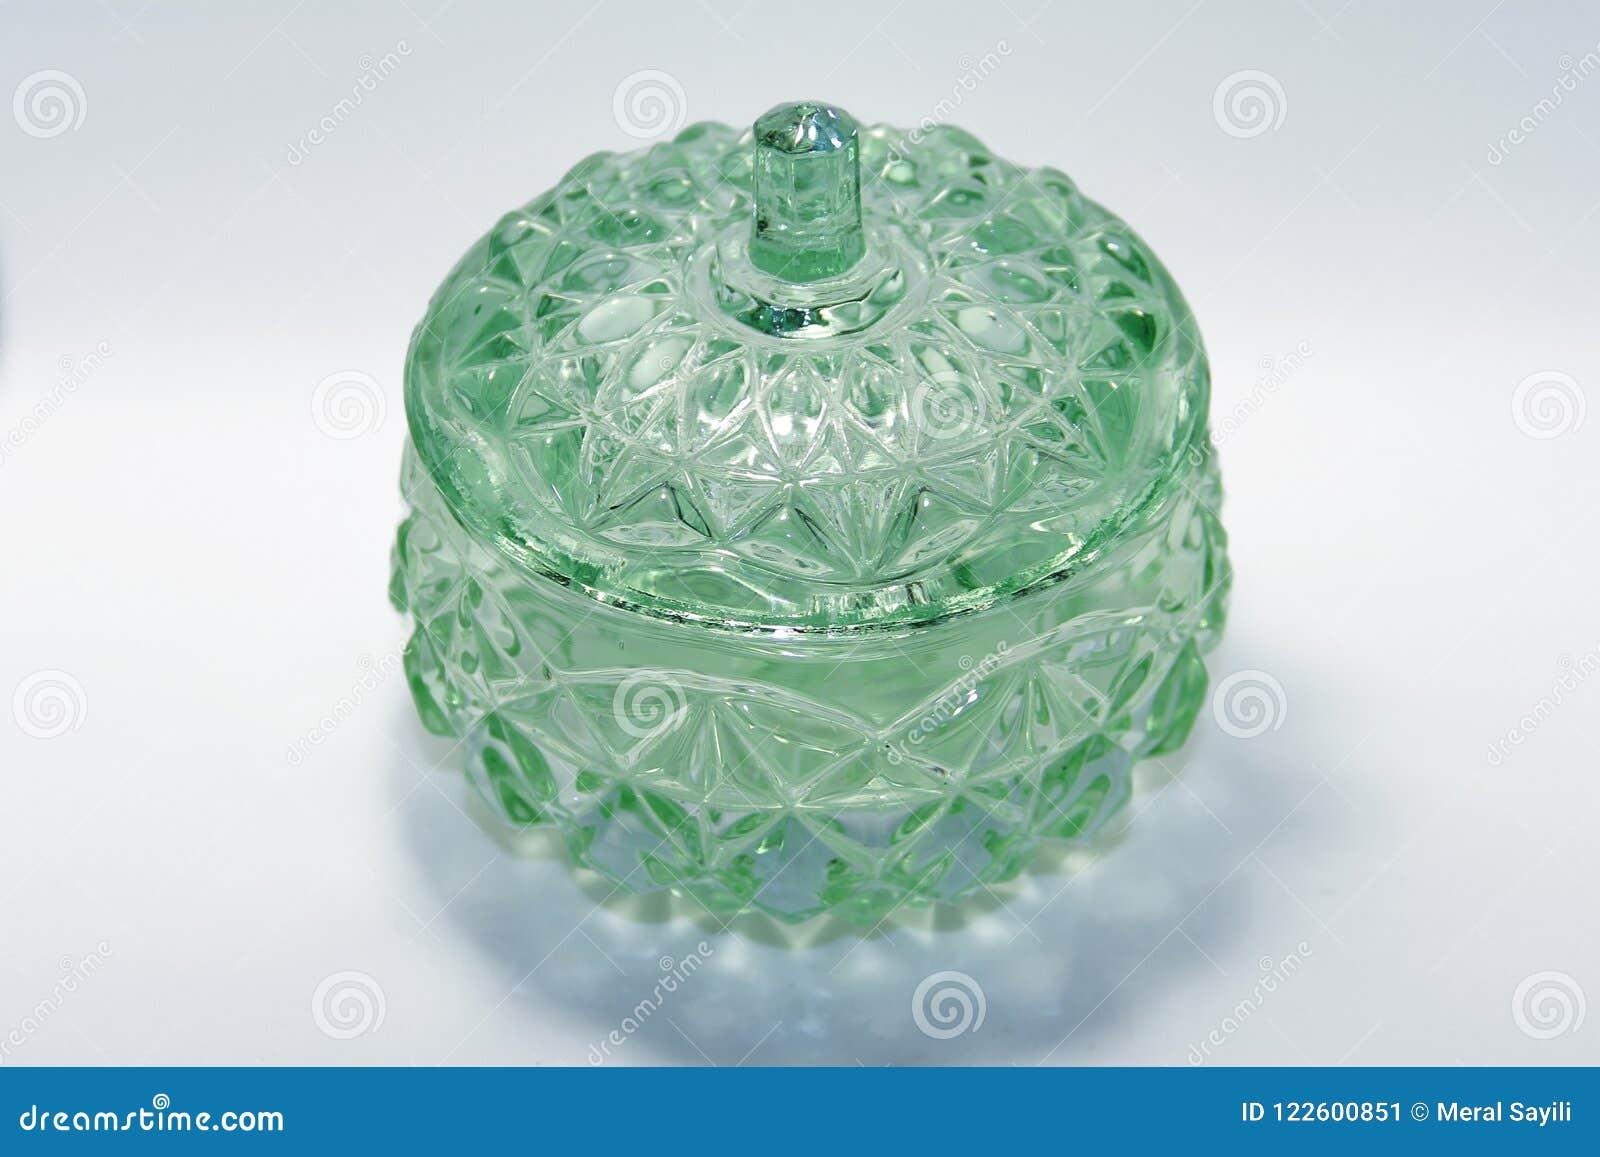 Bol de vidrio verde muy viejo